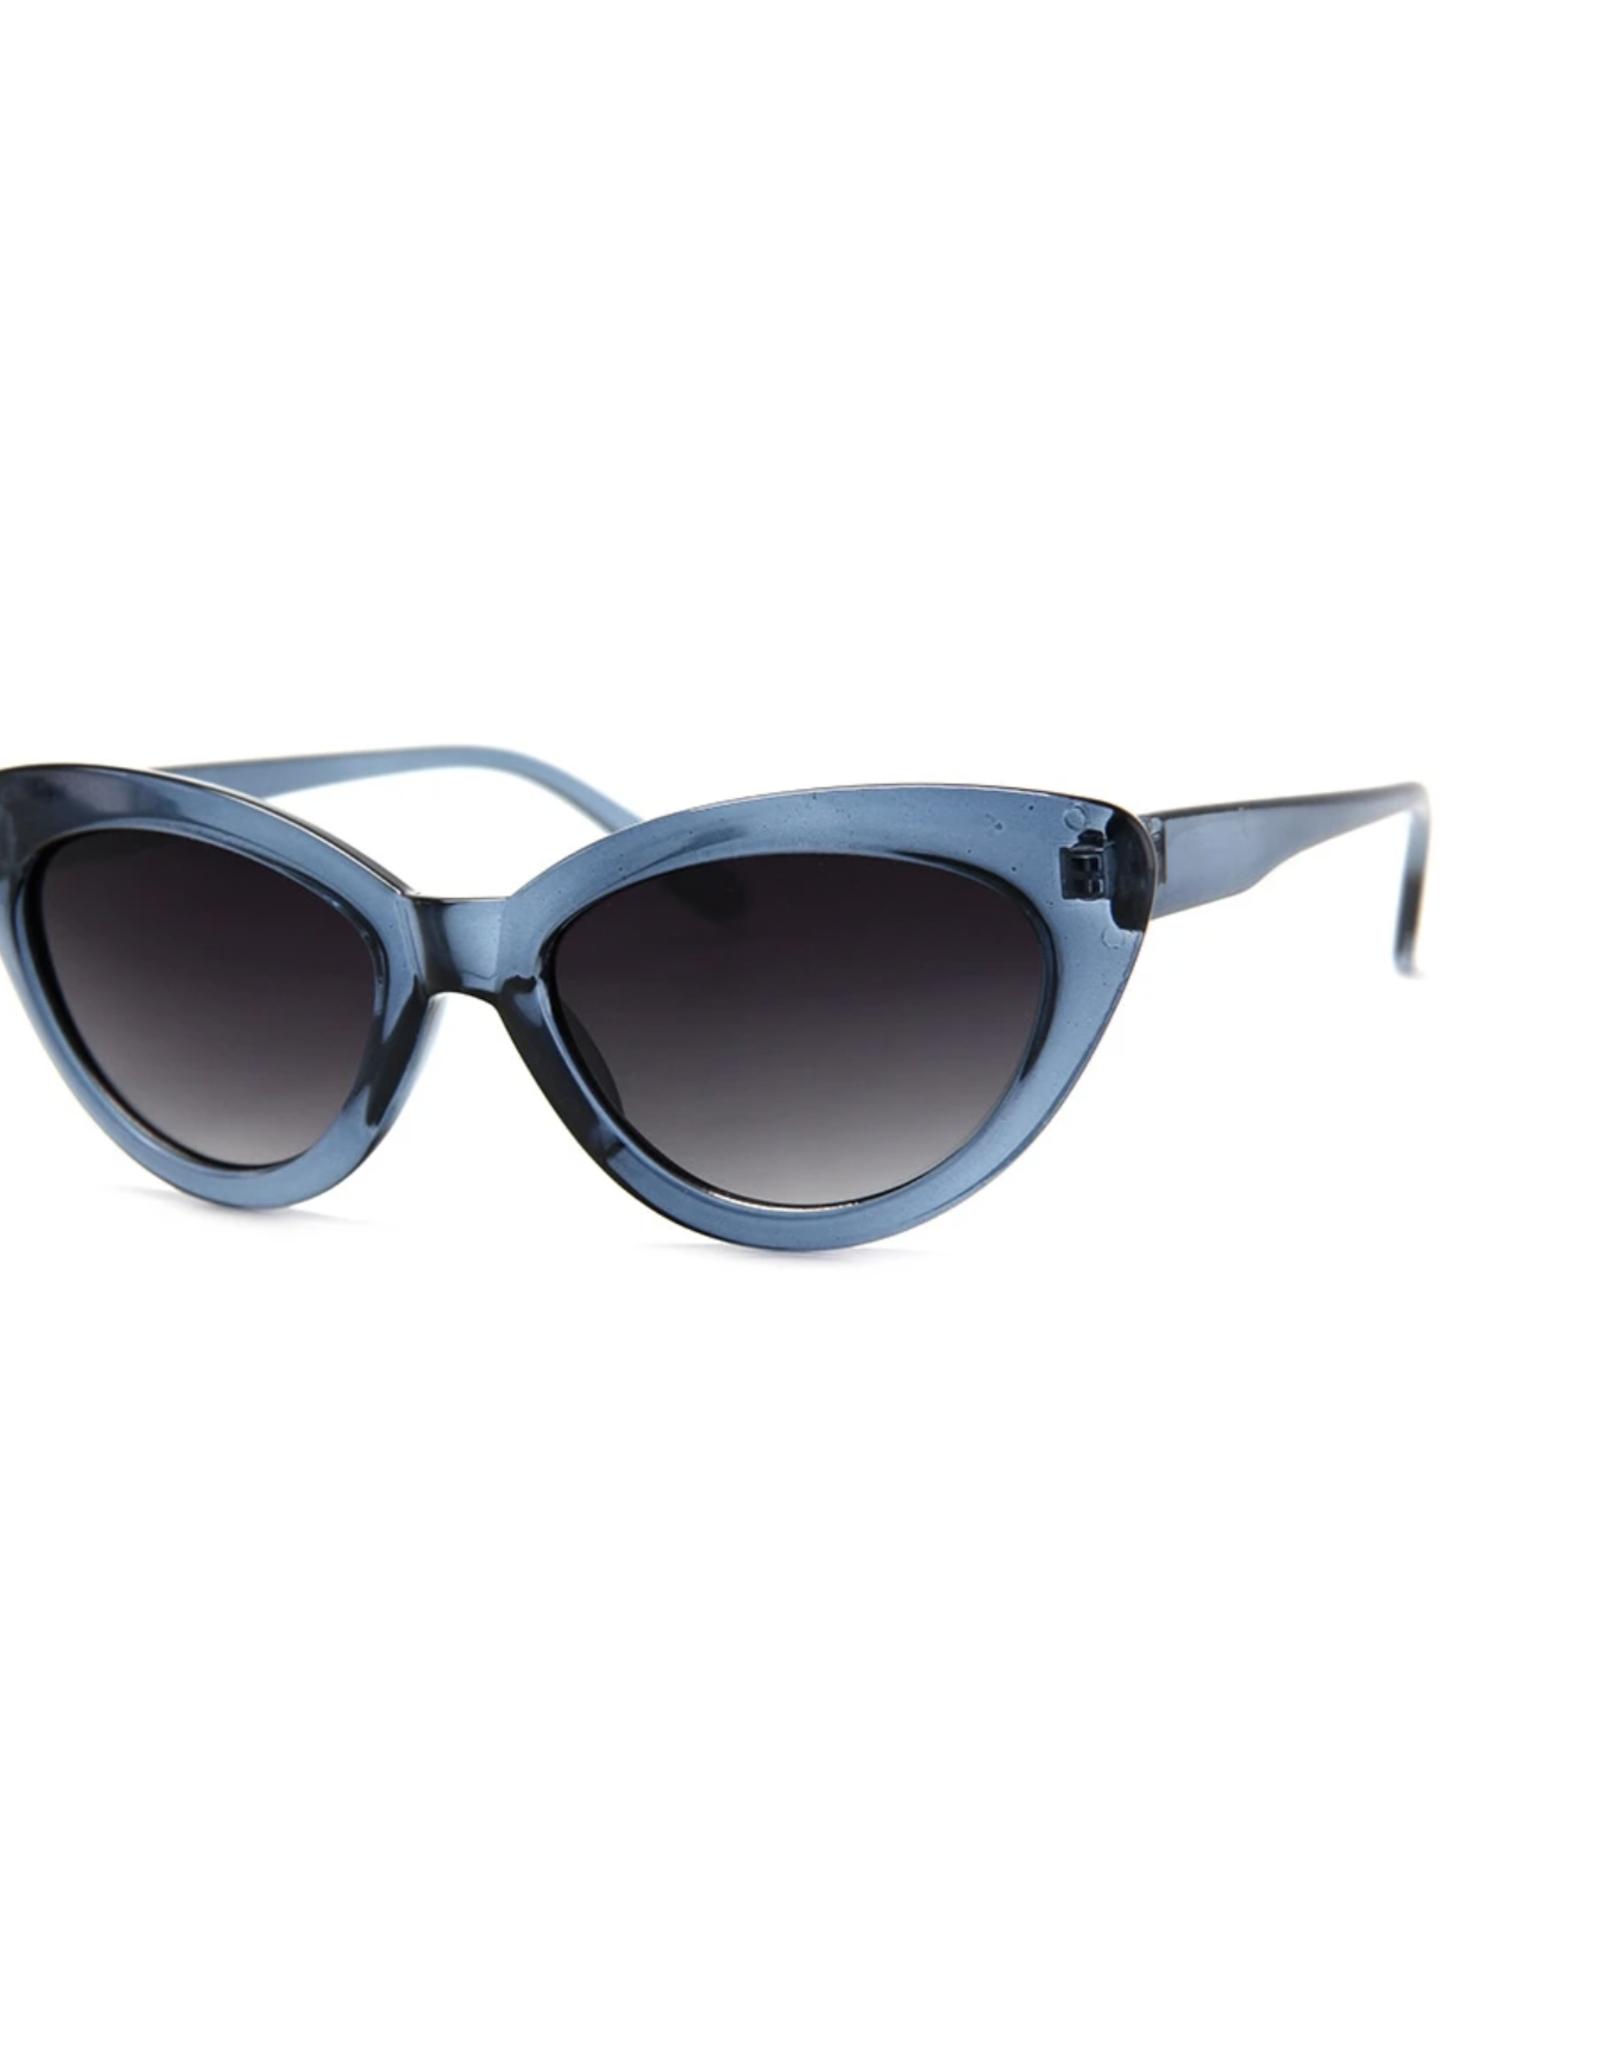 AJ Morgan My Melody Blue Sunglasses, AJ Morgan